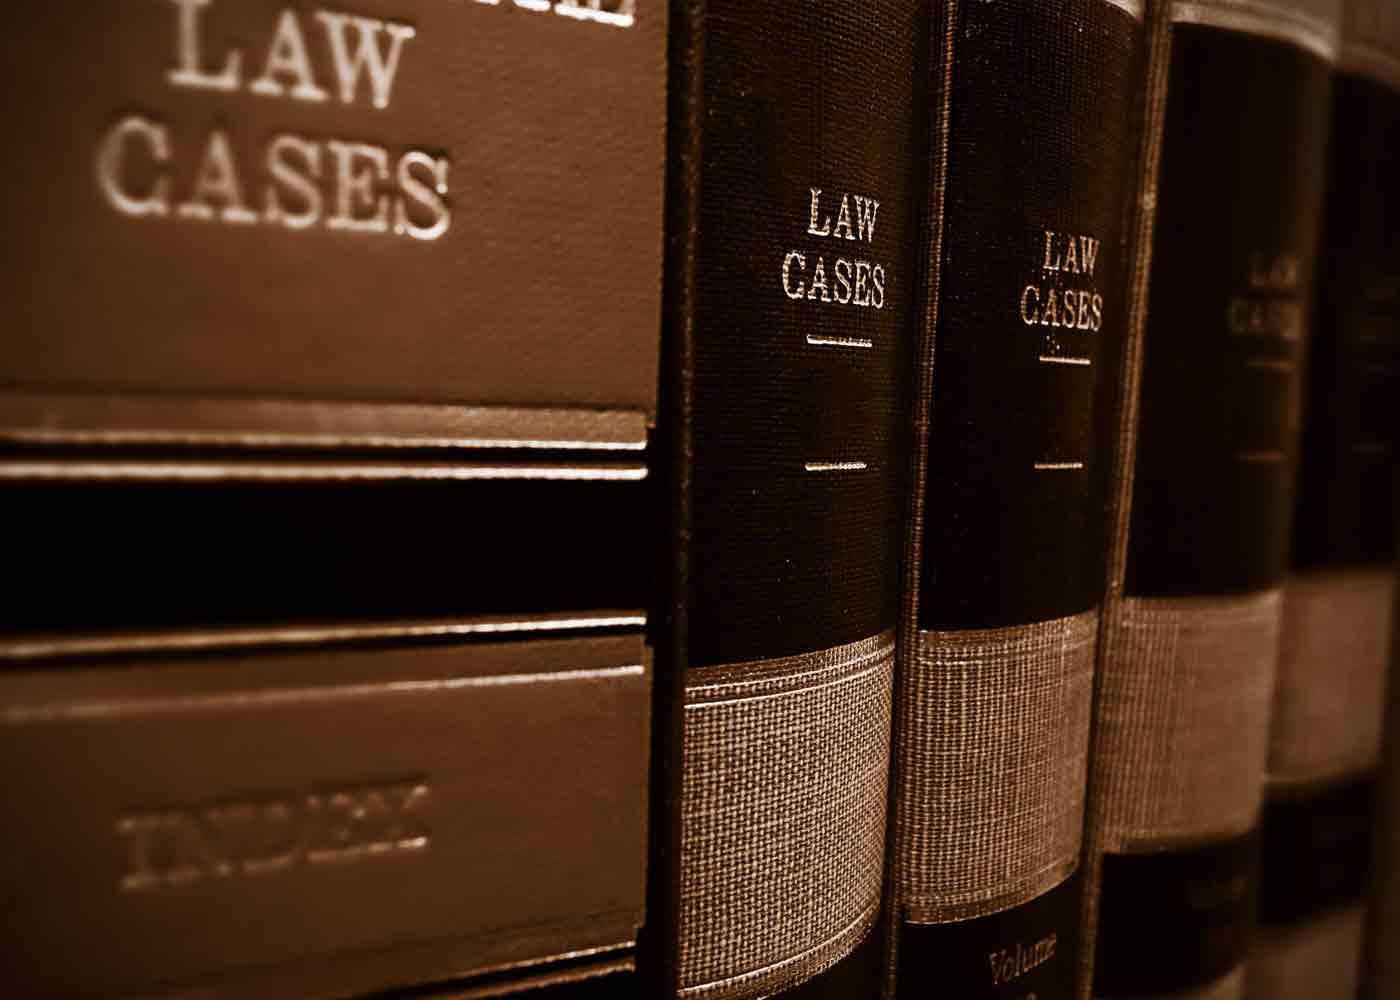 Parties: Plaintiff & Defendant